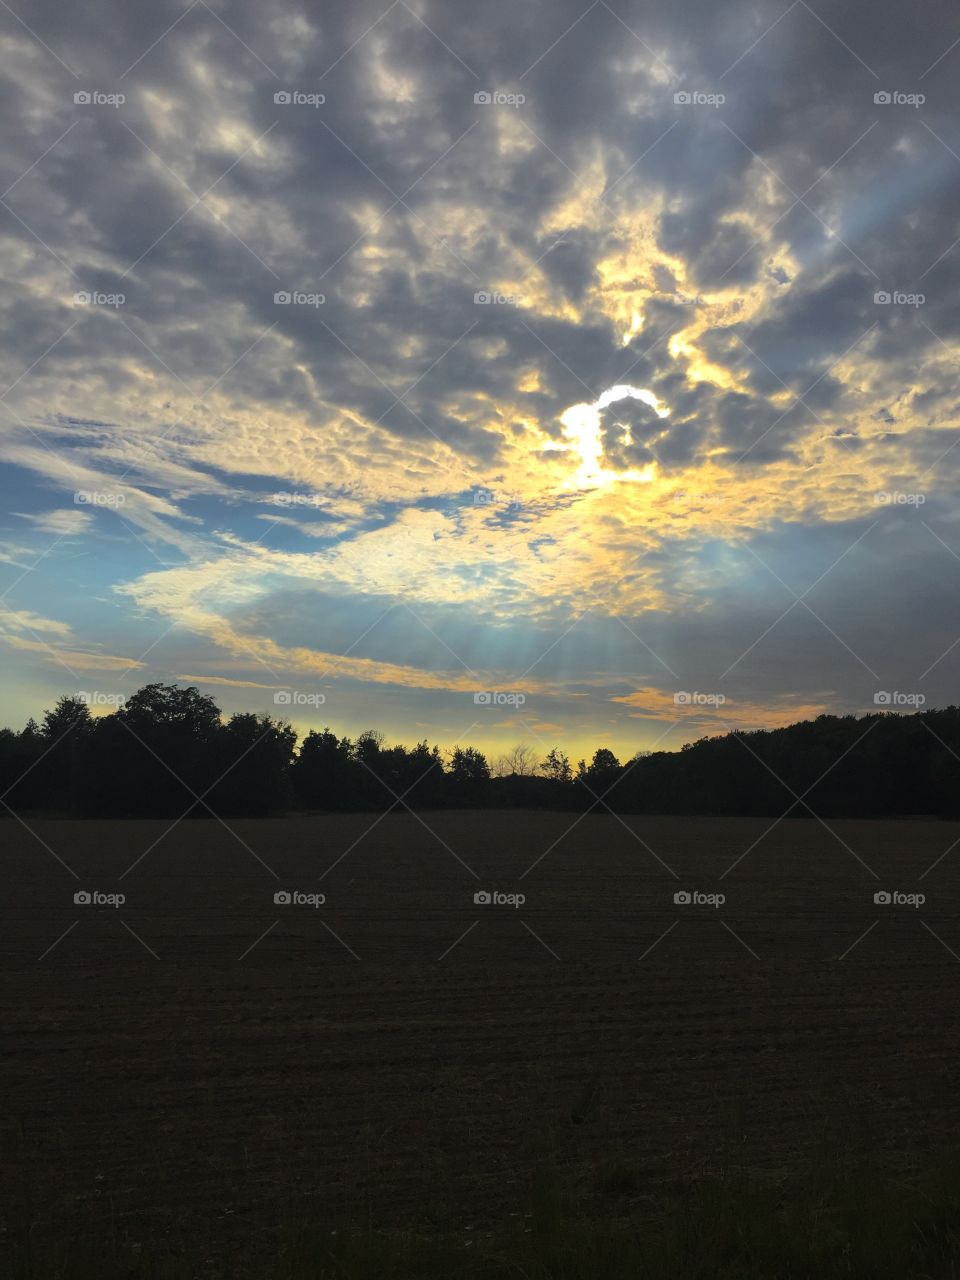 Sunset, Landscape, Dawn, Evening, Sky